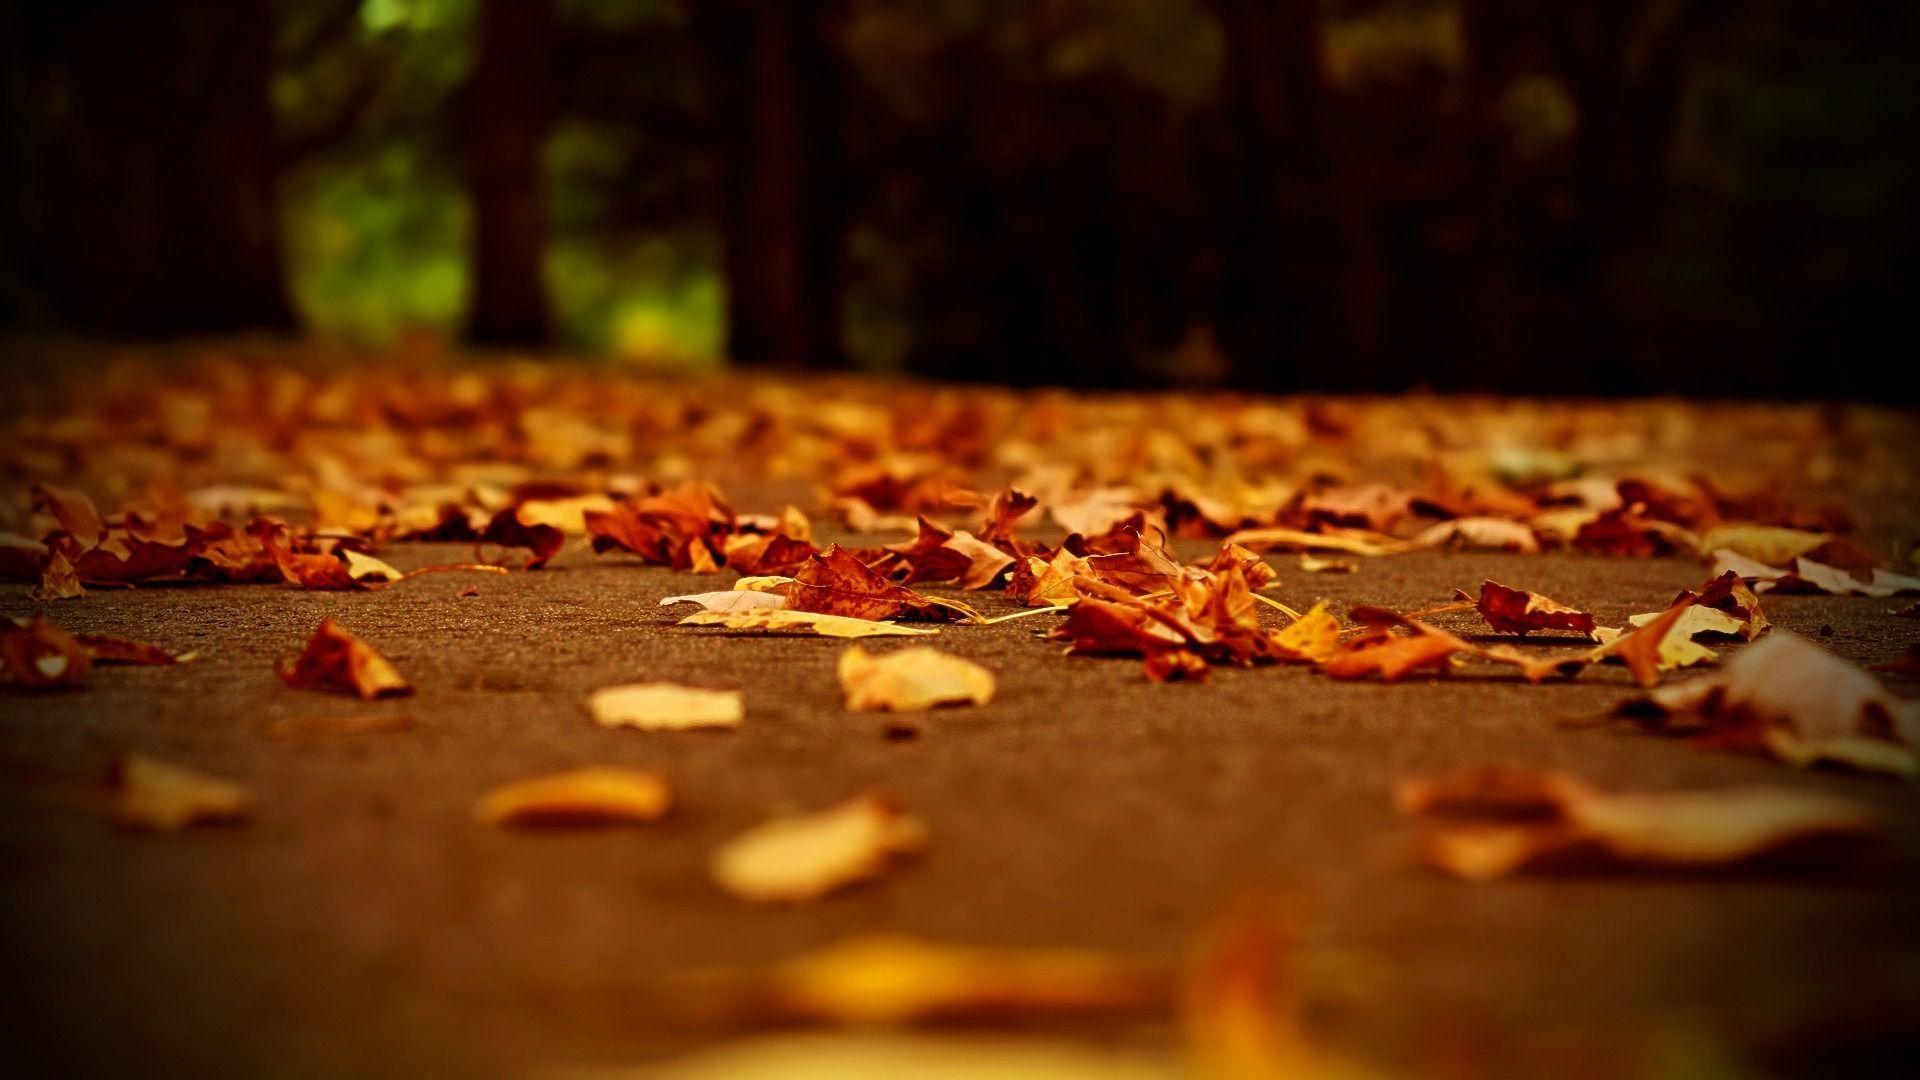 dark fall backgrounds